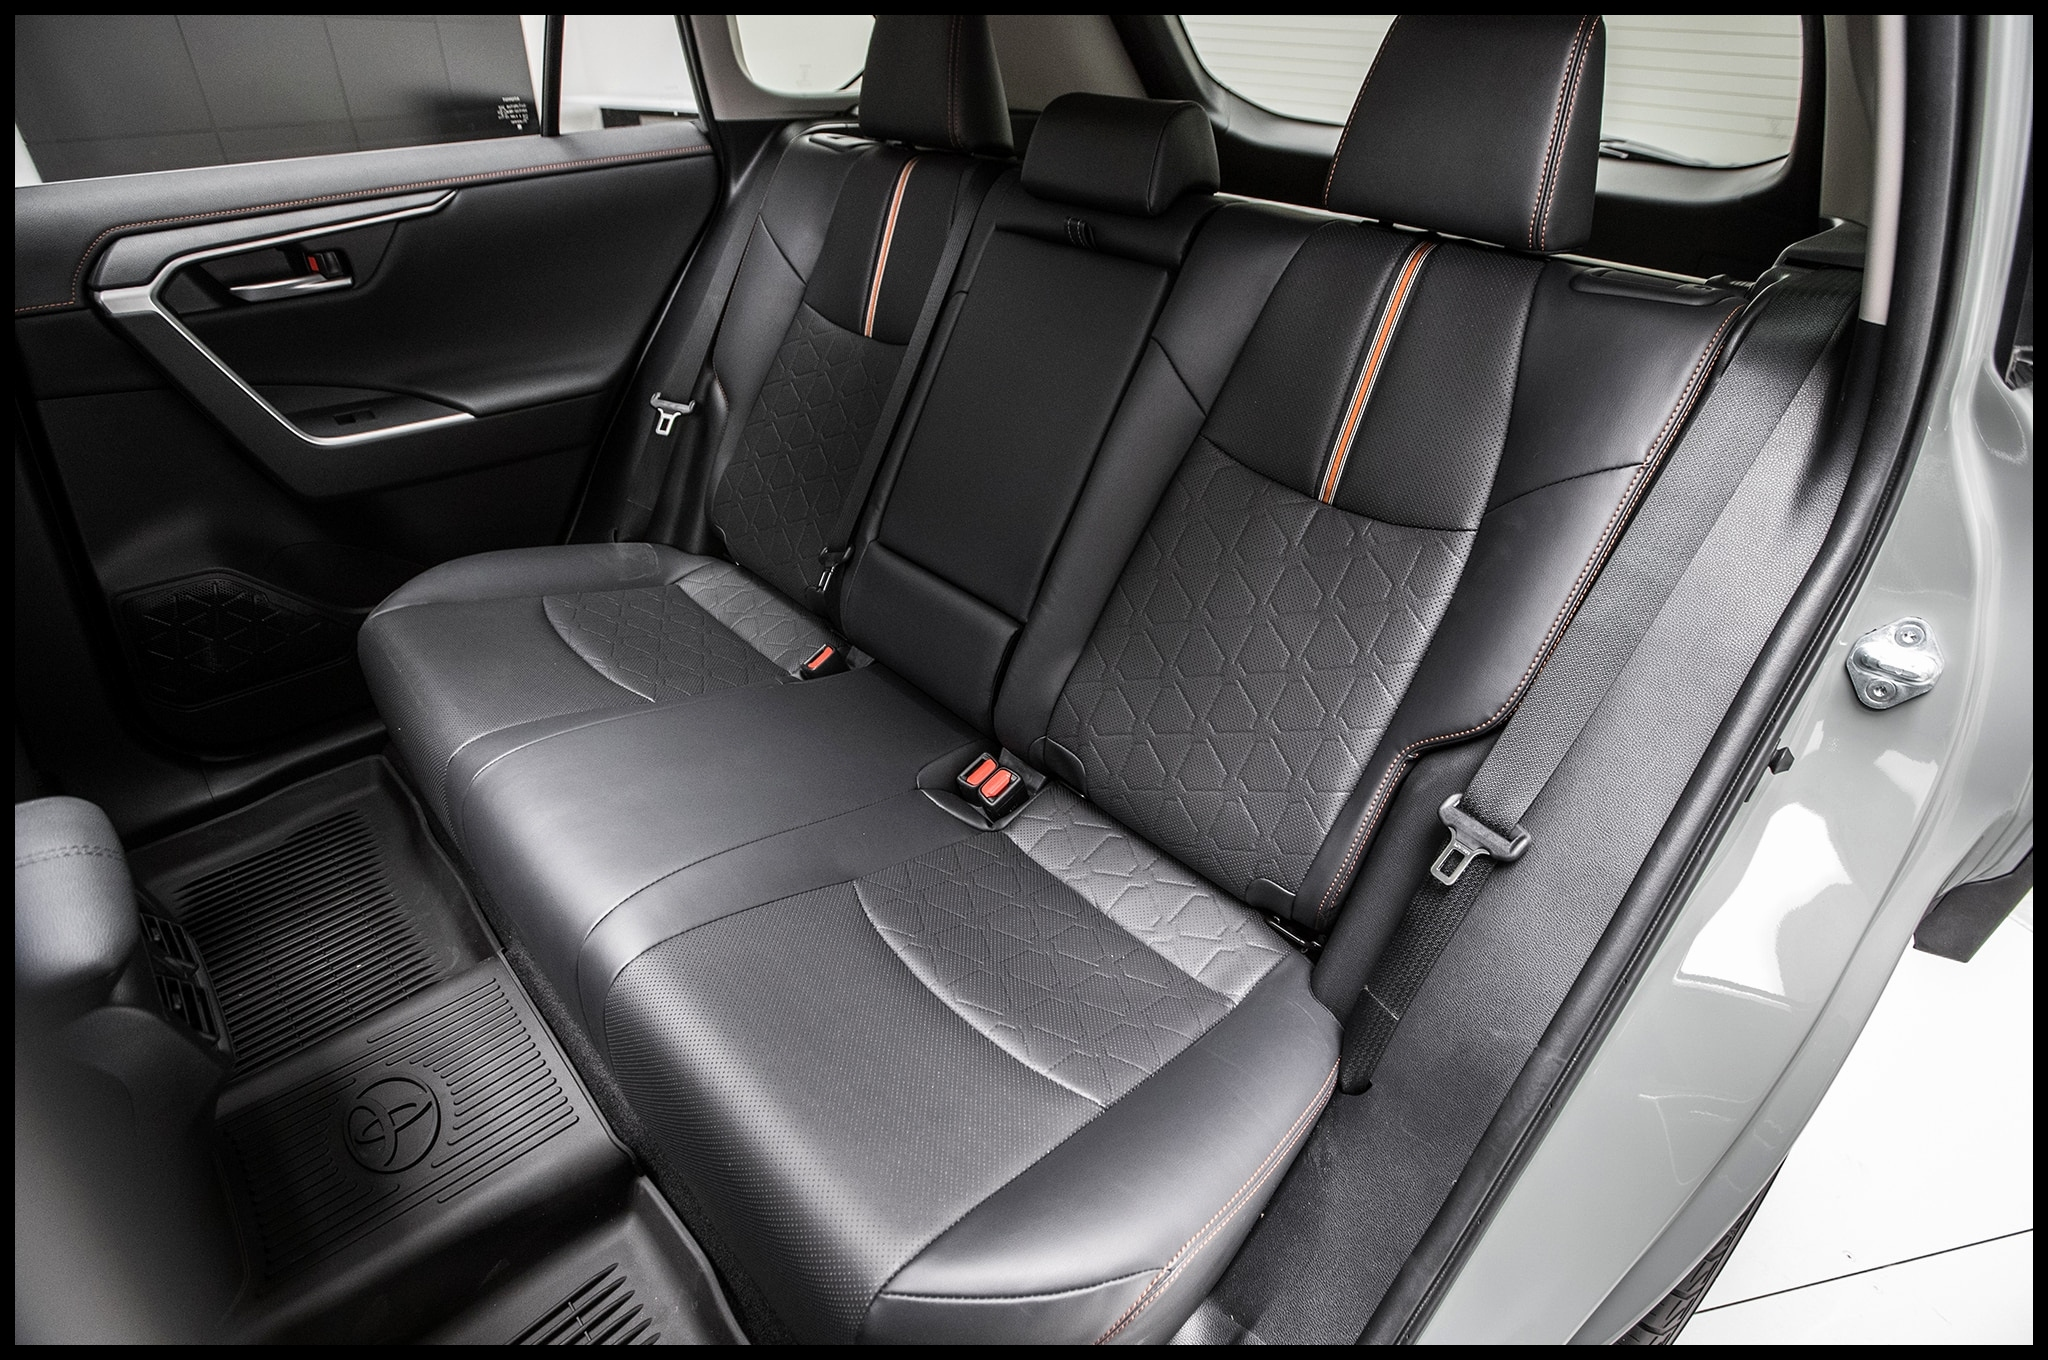 Hot News Rav4 Rear Seat Covers Best toyota Rav4 2 0d 4d Lounge 4—4